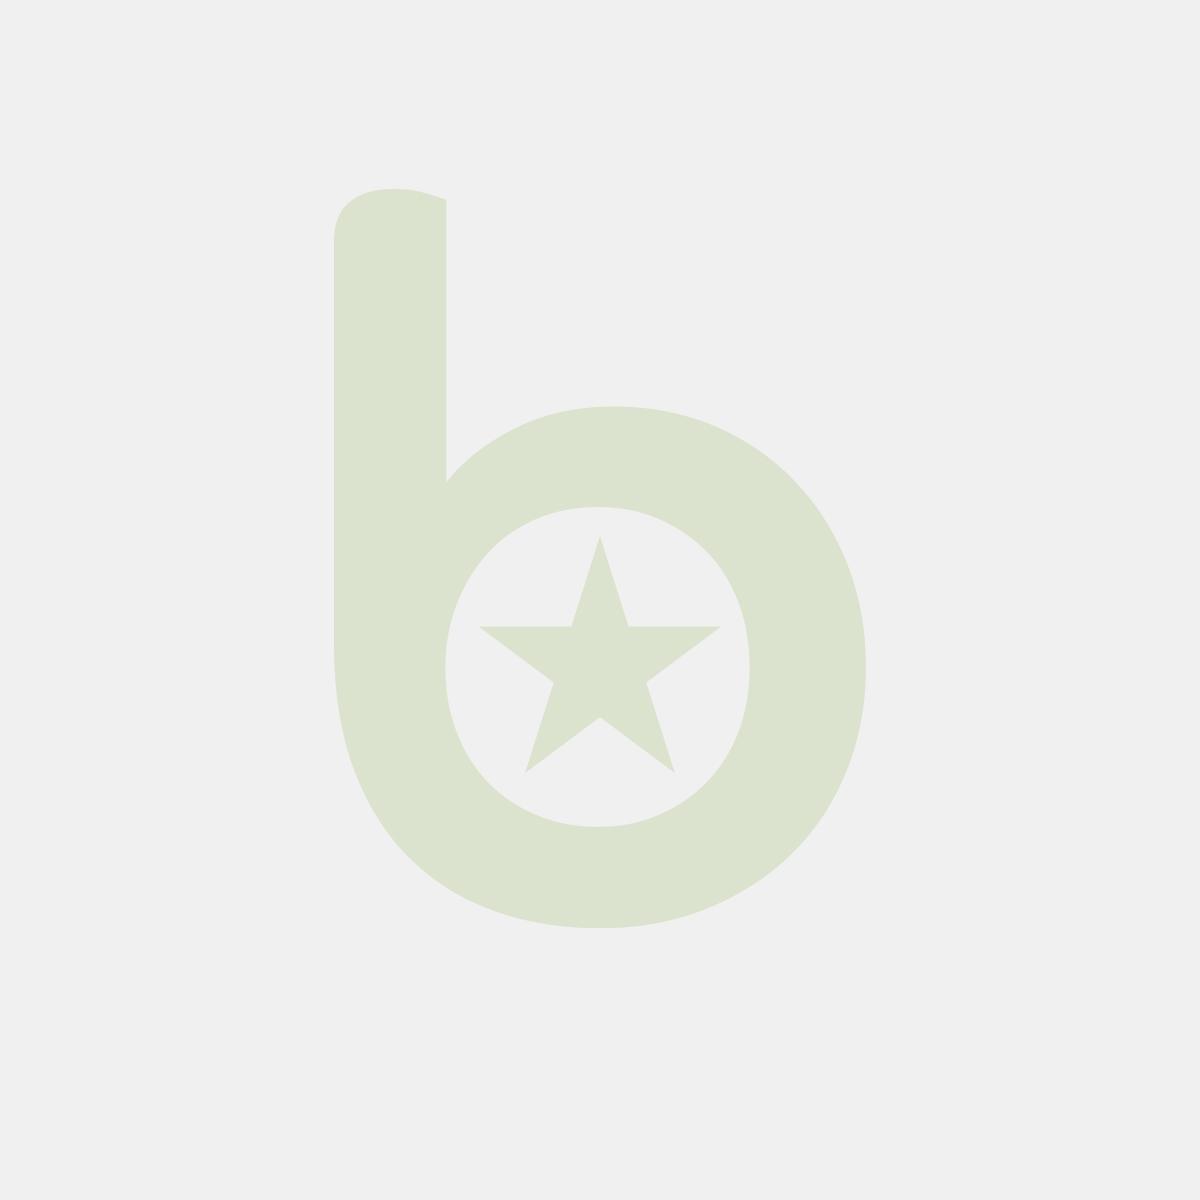 FINGERFOOD - pucharek MINI transparent SABERT 5,7 x 5,7 x 3 cm op. 20 sztuk